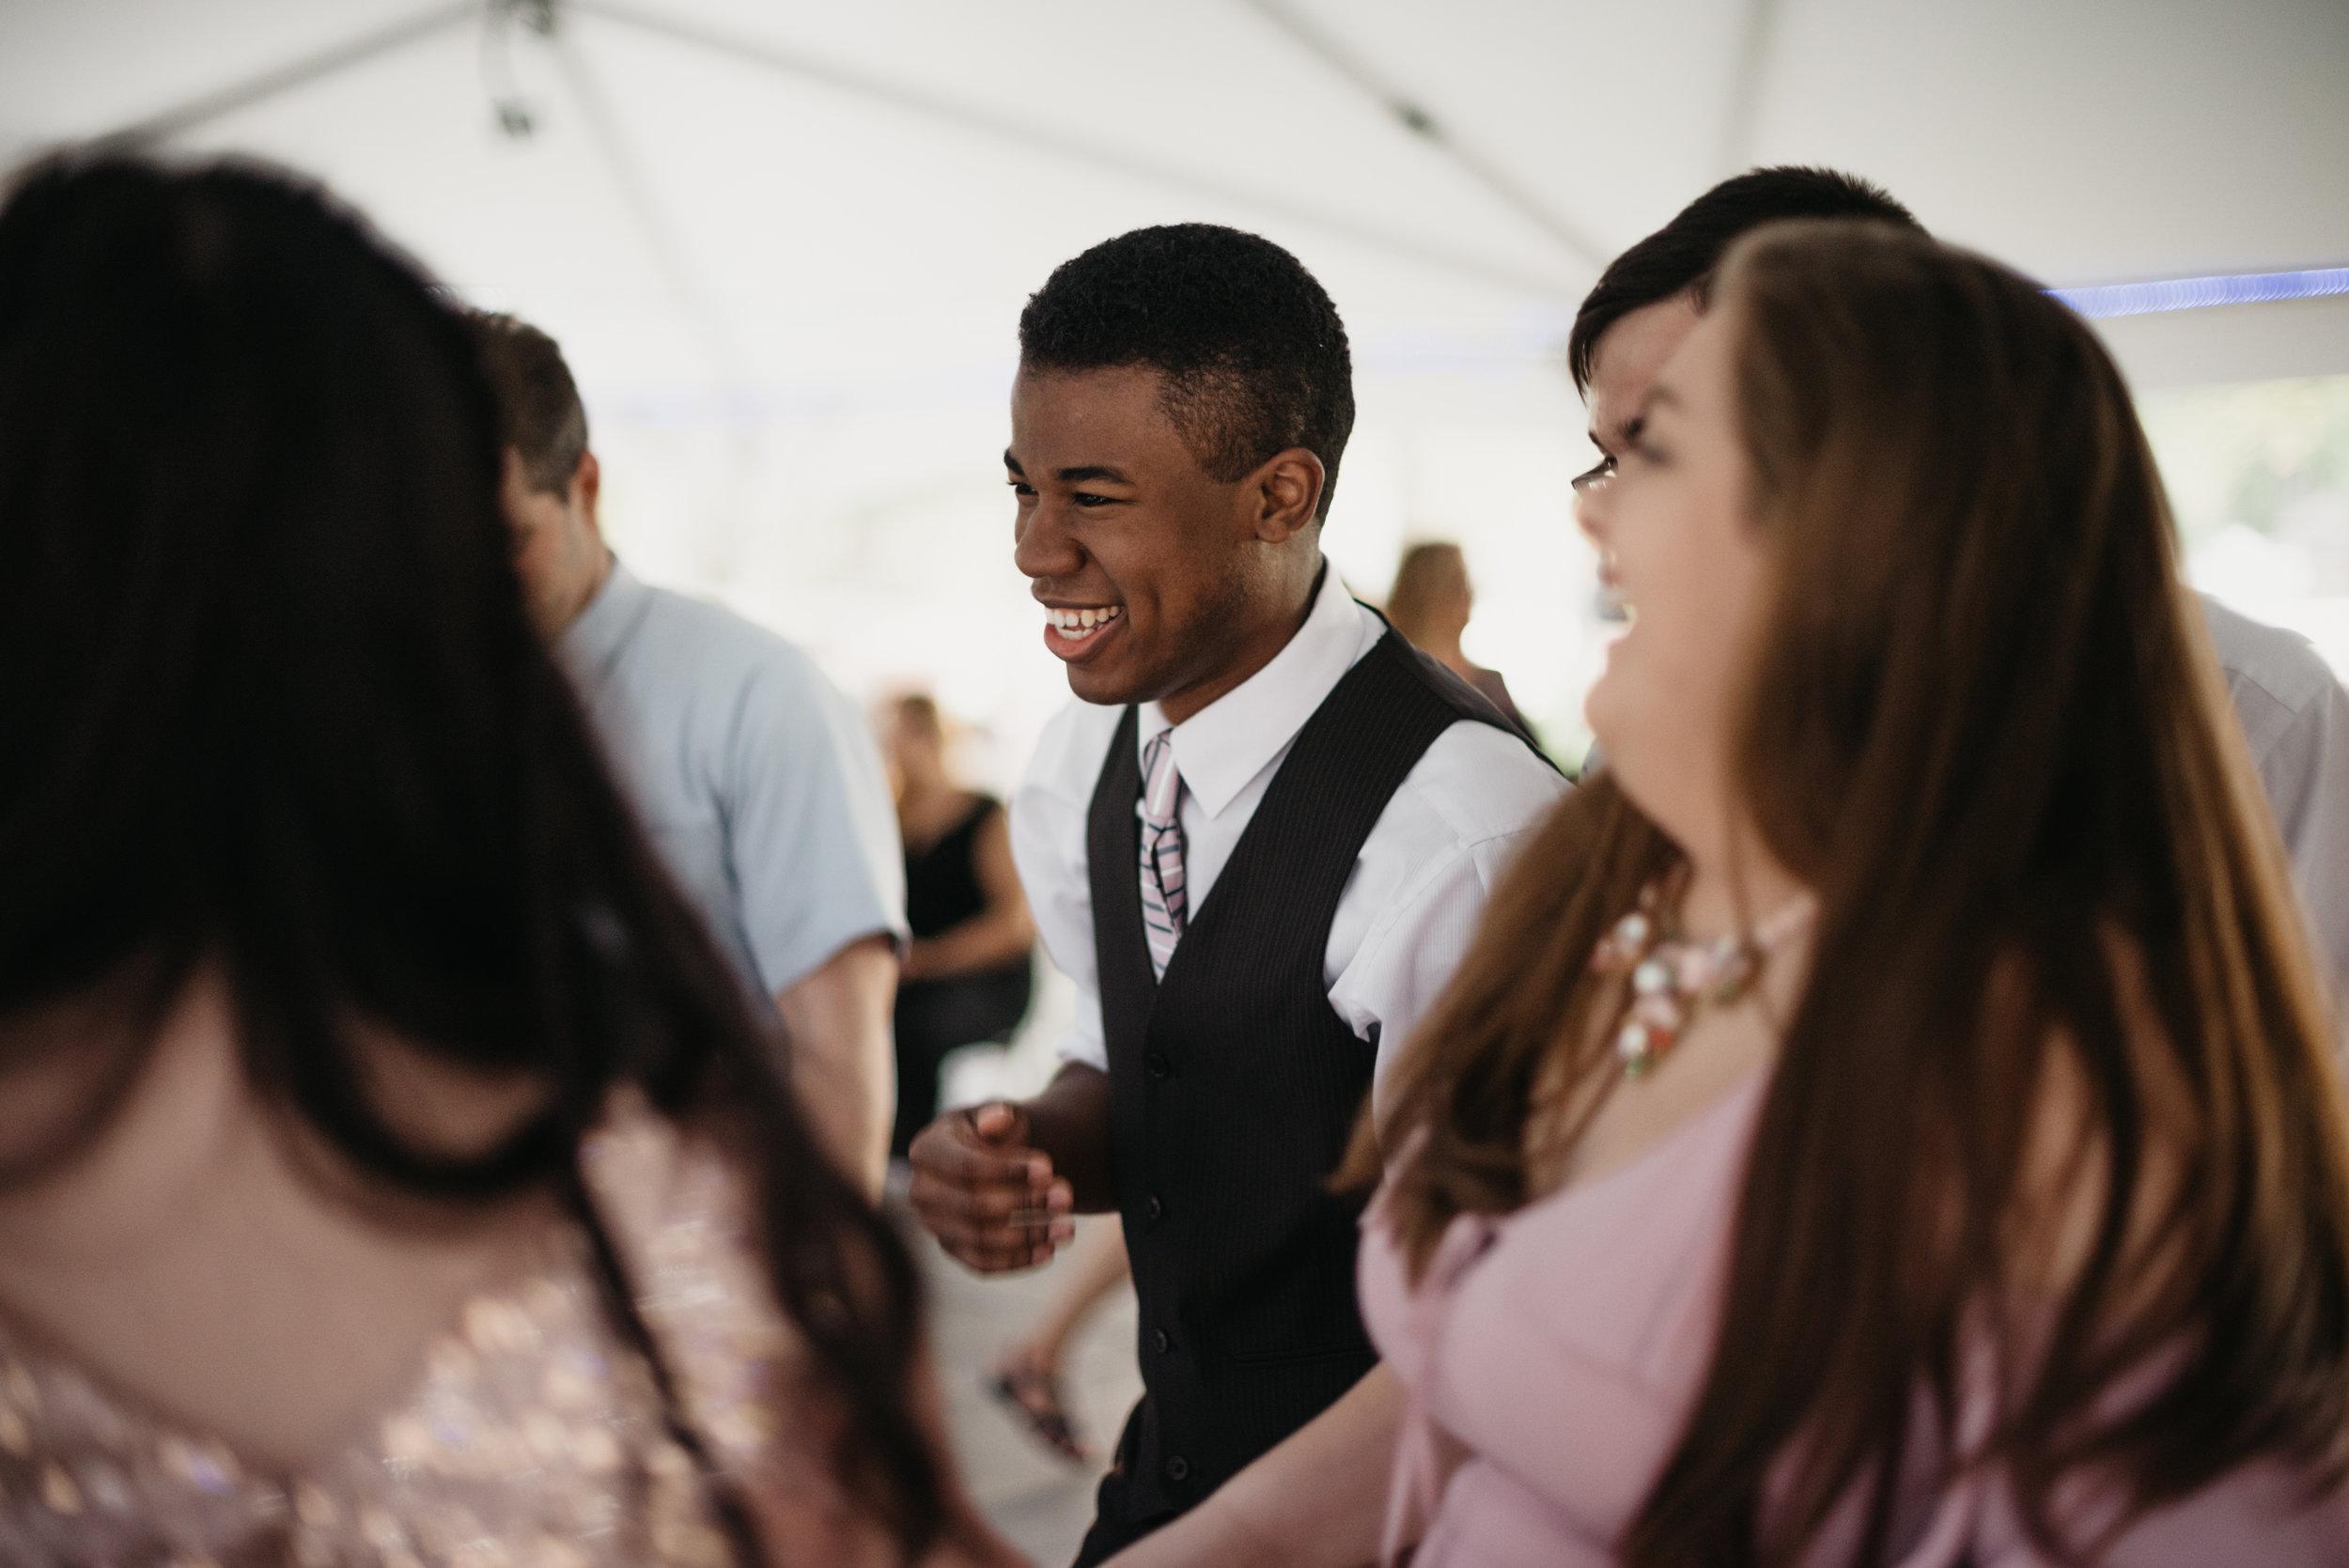 Barch-Massachusetts-Lakeside Tent Wedding-Western Massachusetts Wedding Photographer-03439.jpg